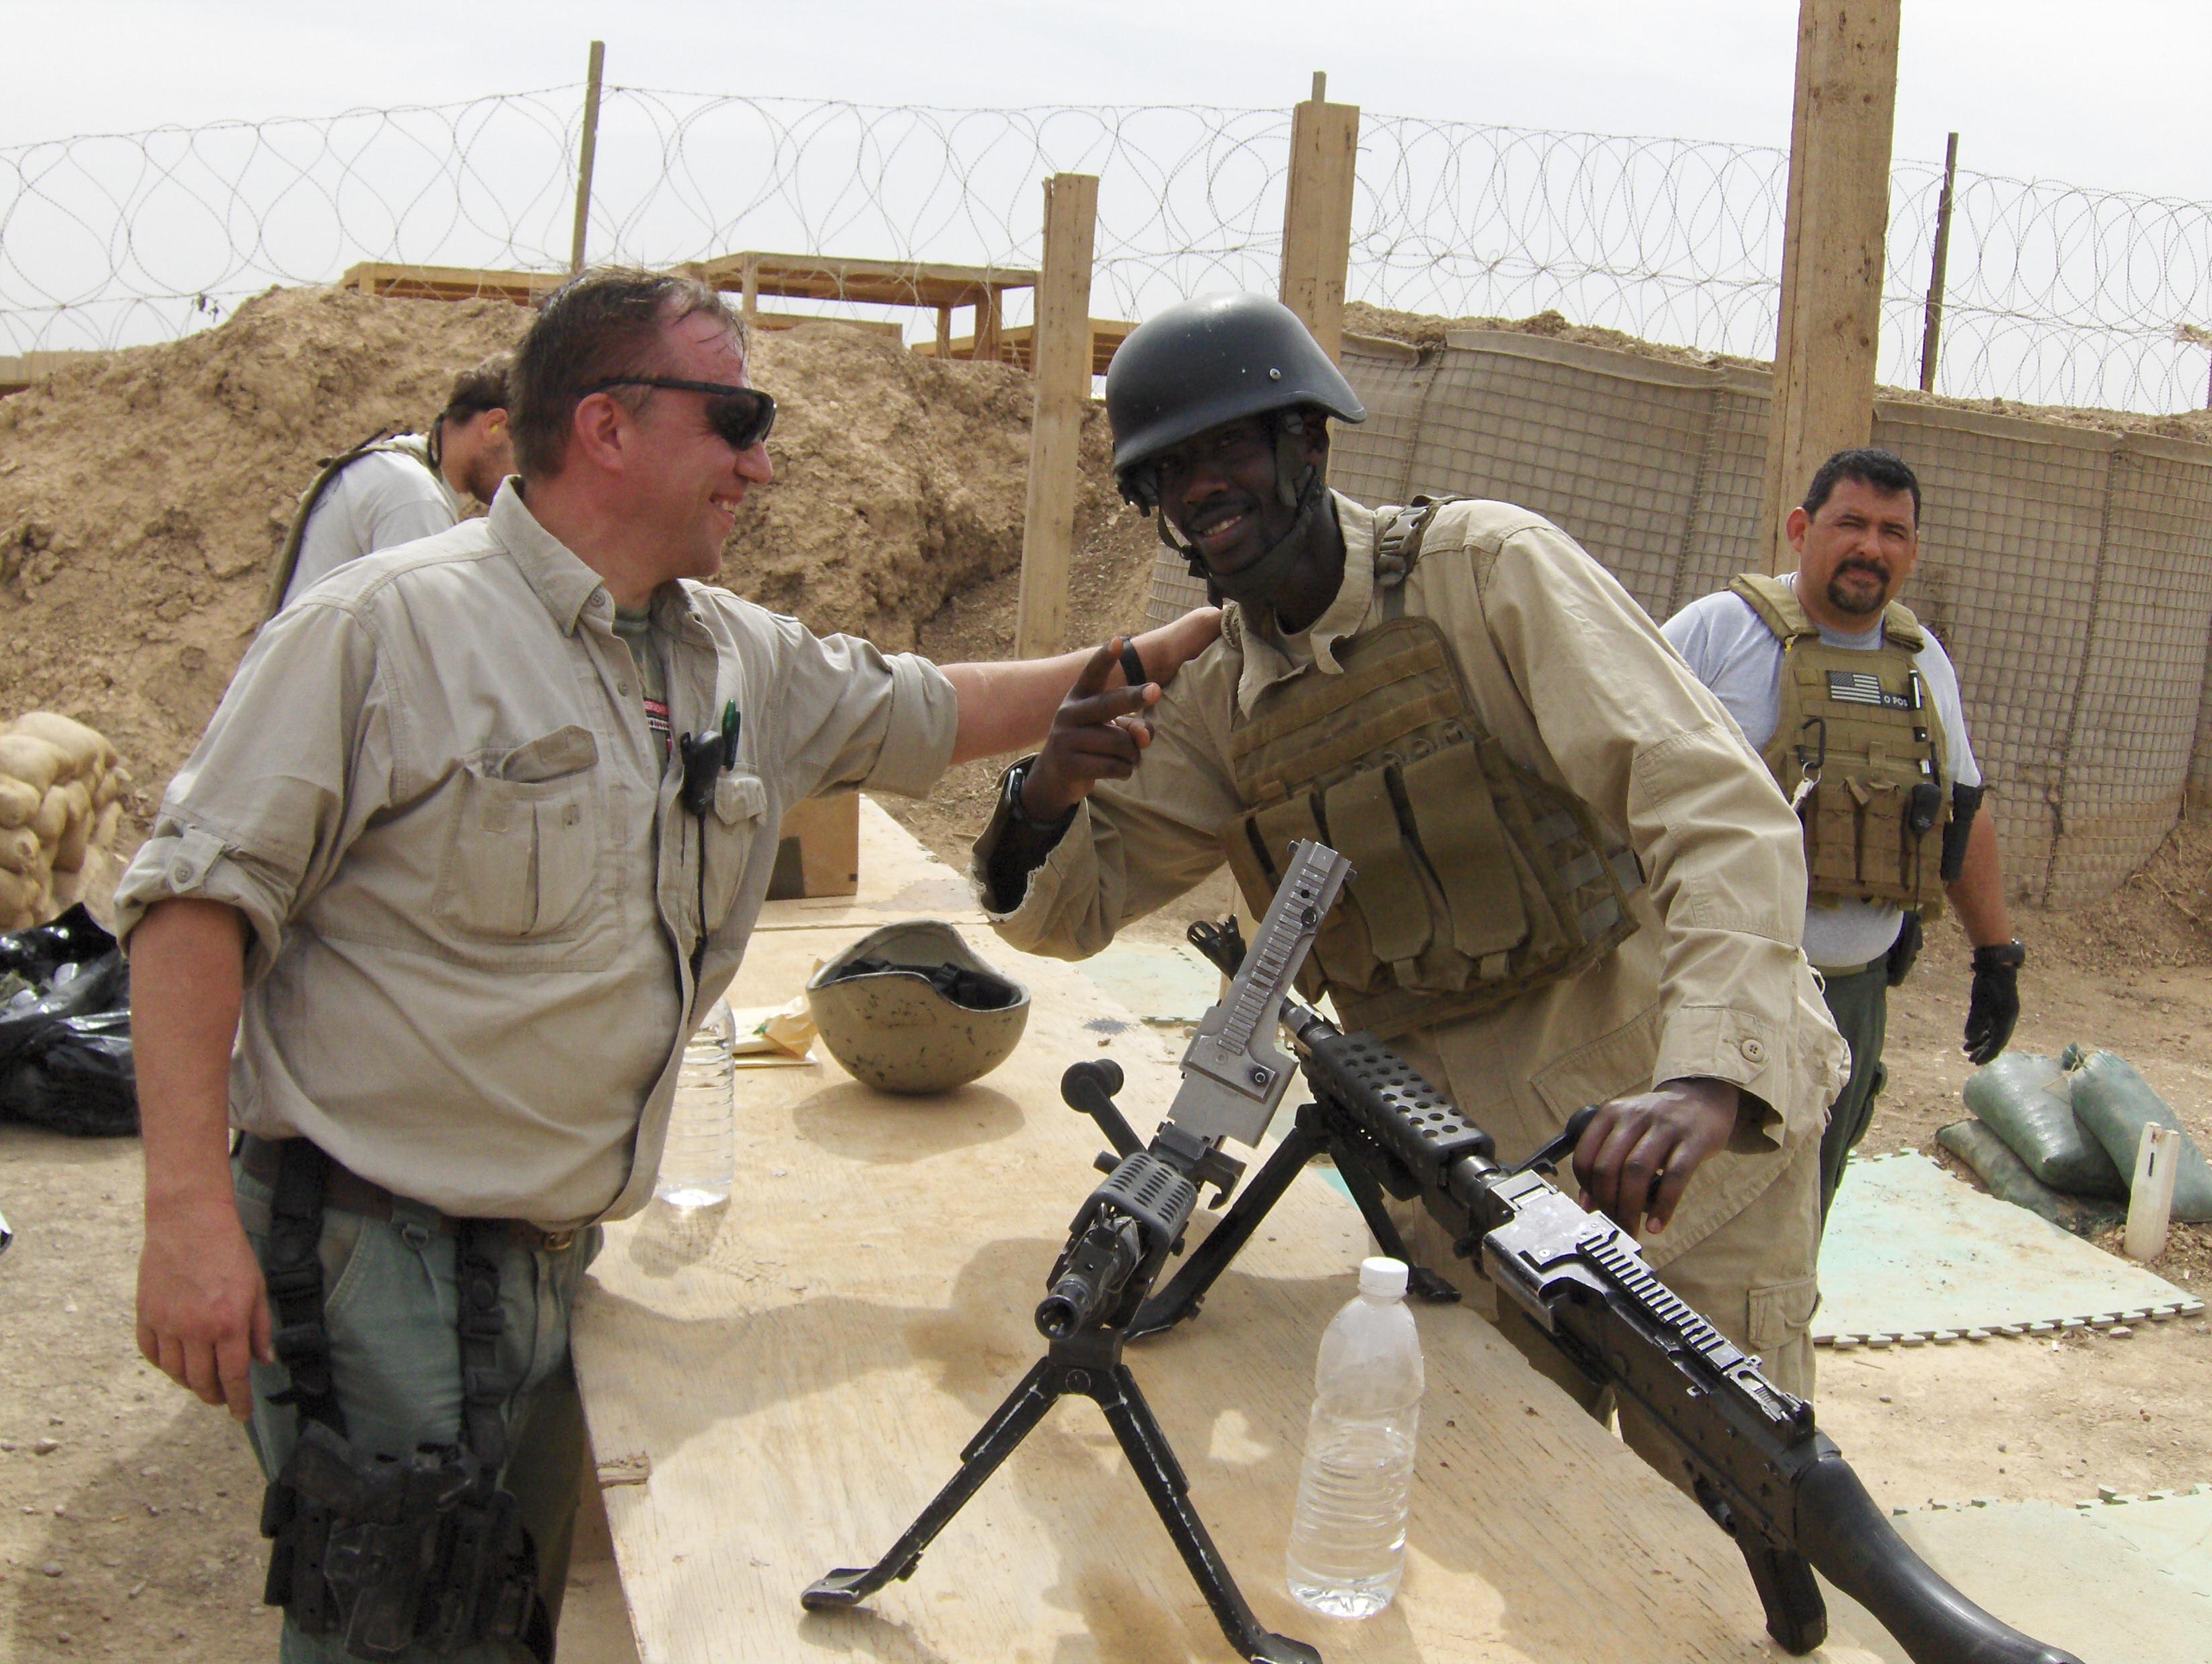 Oleg and David and machineguns